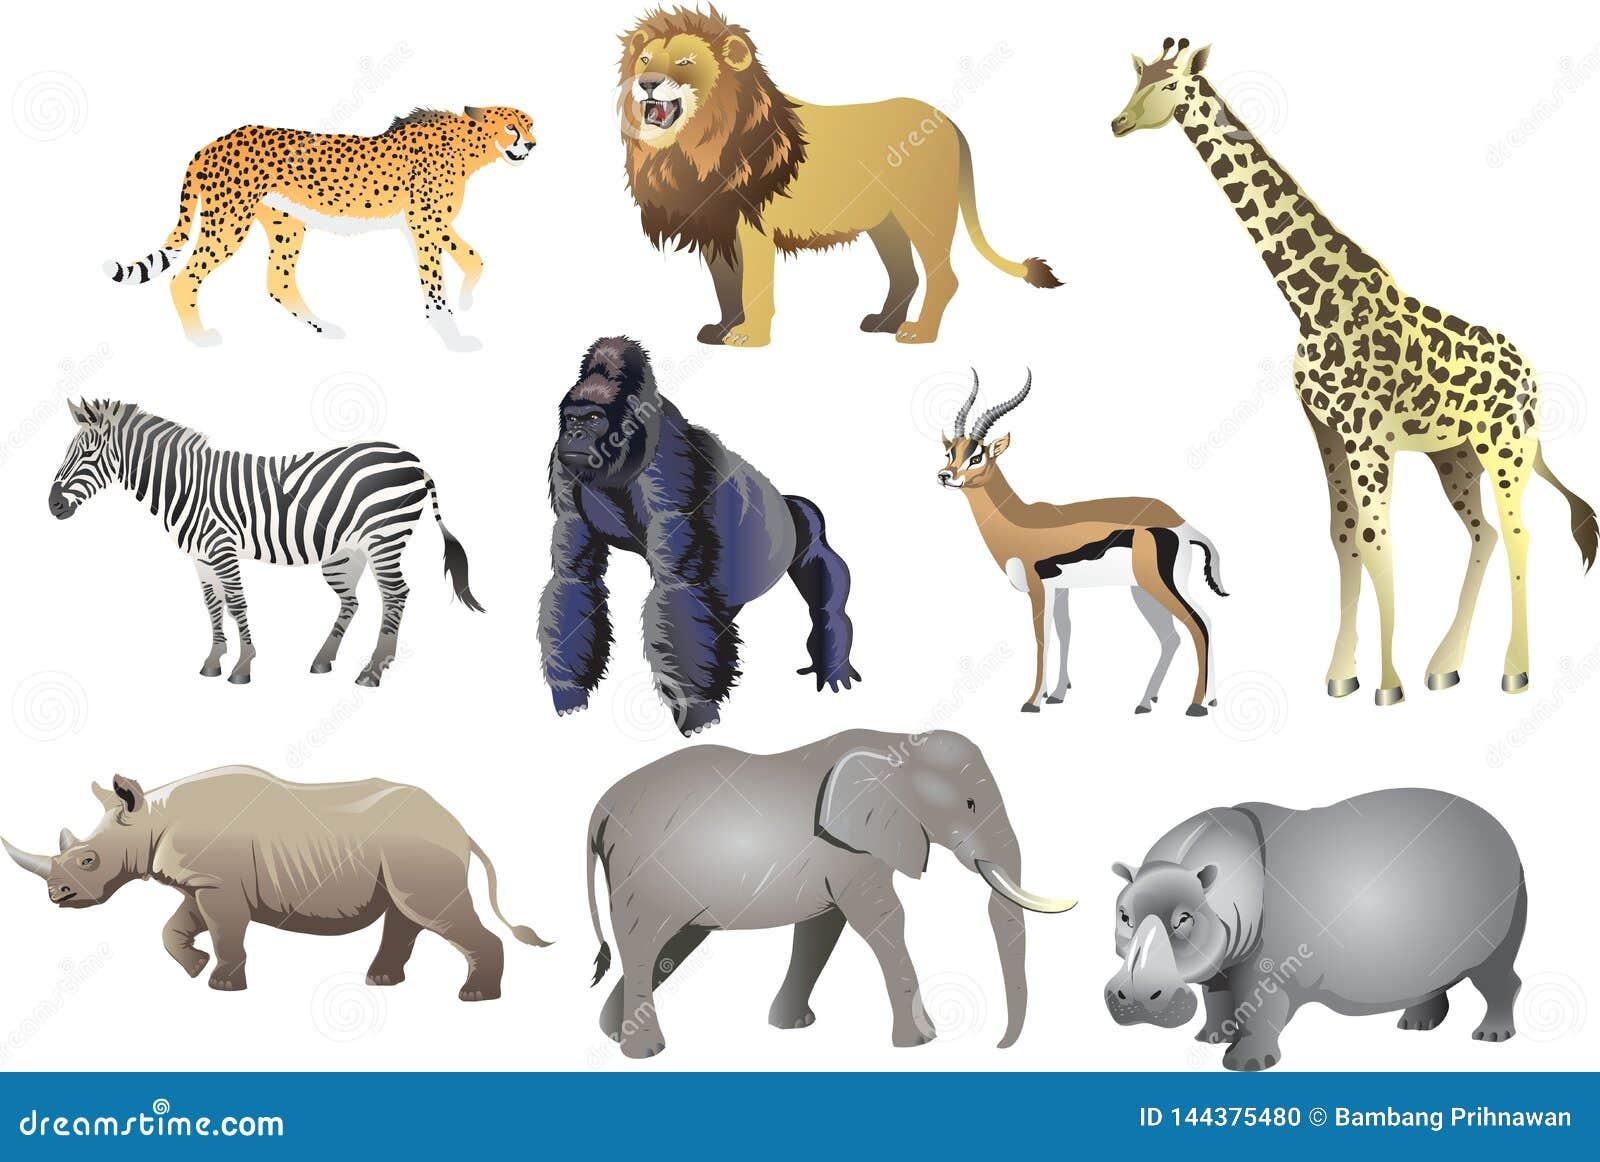 Group Of African Animal Wild Life , Cheetah, Lion, Giraffe, Zebra, Gorilla, Antelope, Rhino, Elephant, Hippopotamus - Vector Illus